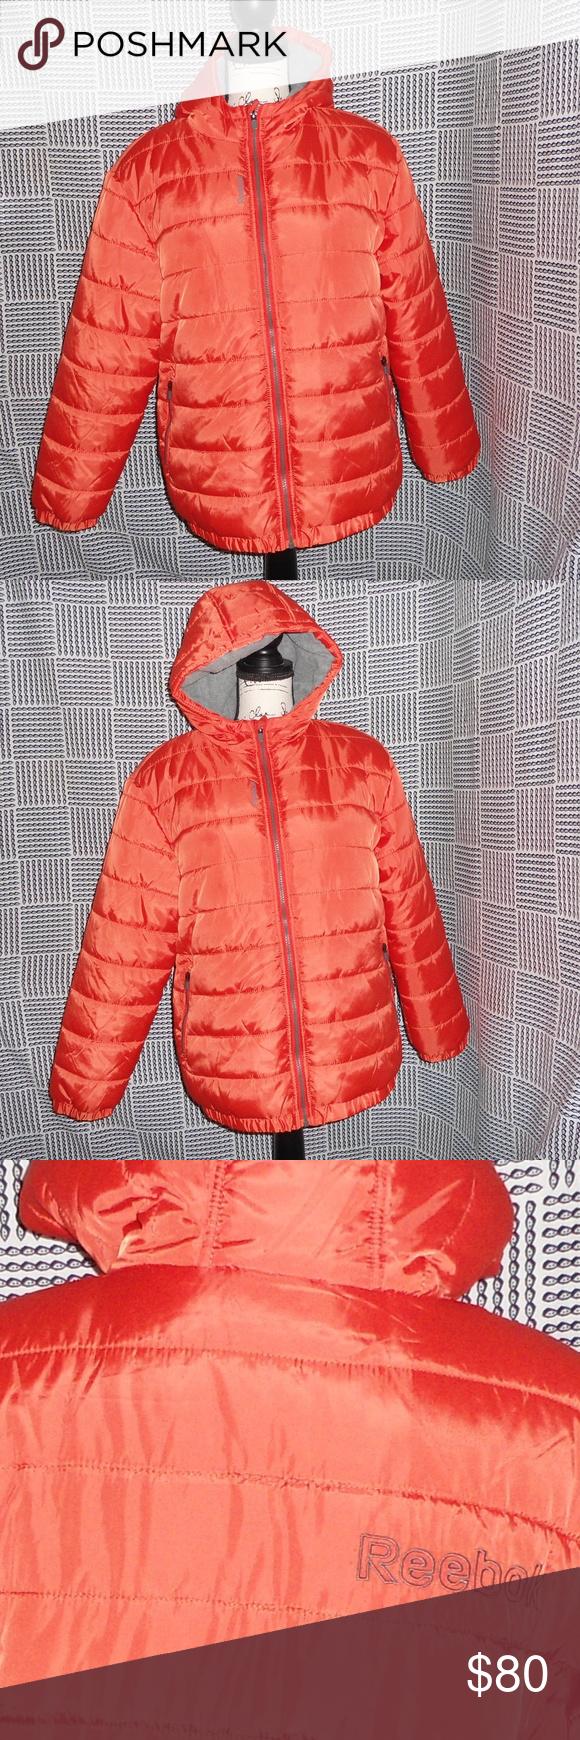 Reebok Puffer Jacket Clothes Design Fashion Reebok Logo [ 1740 x 580 Pixel ]